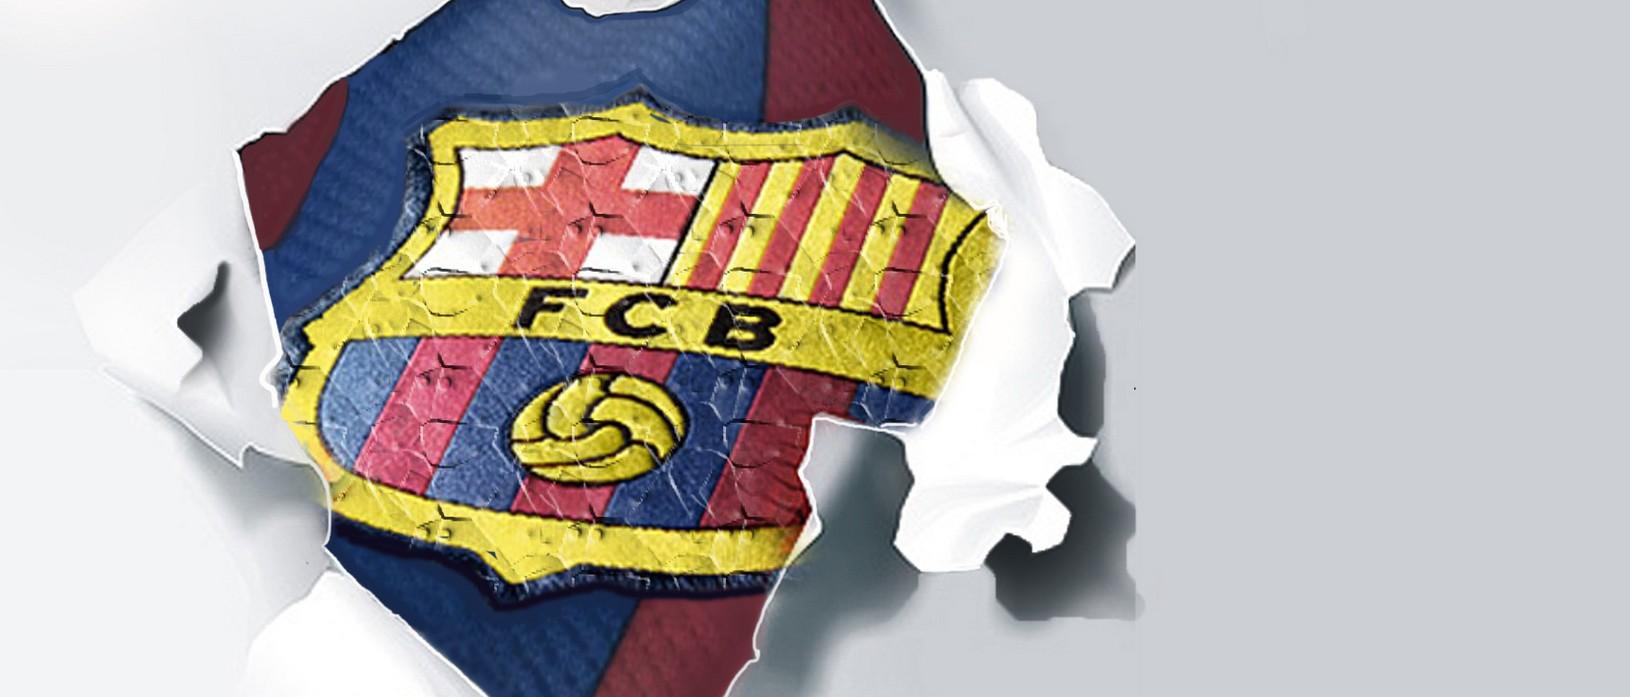 FC-Barcelona-Logo-Wallpaper-fc-barcelona-22614266-1721-1136